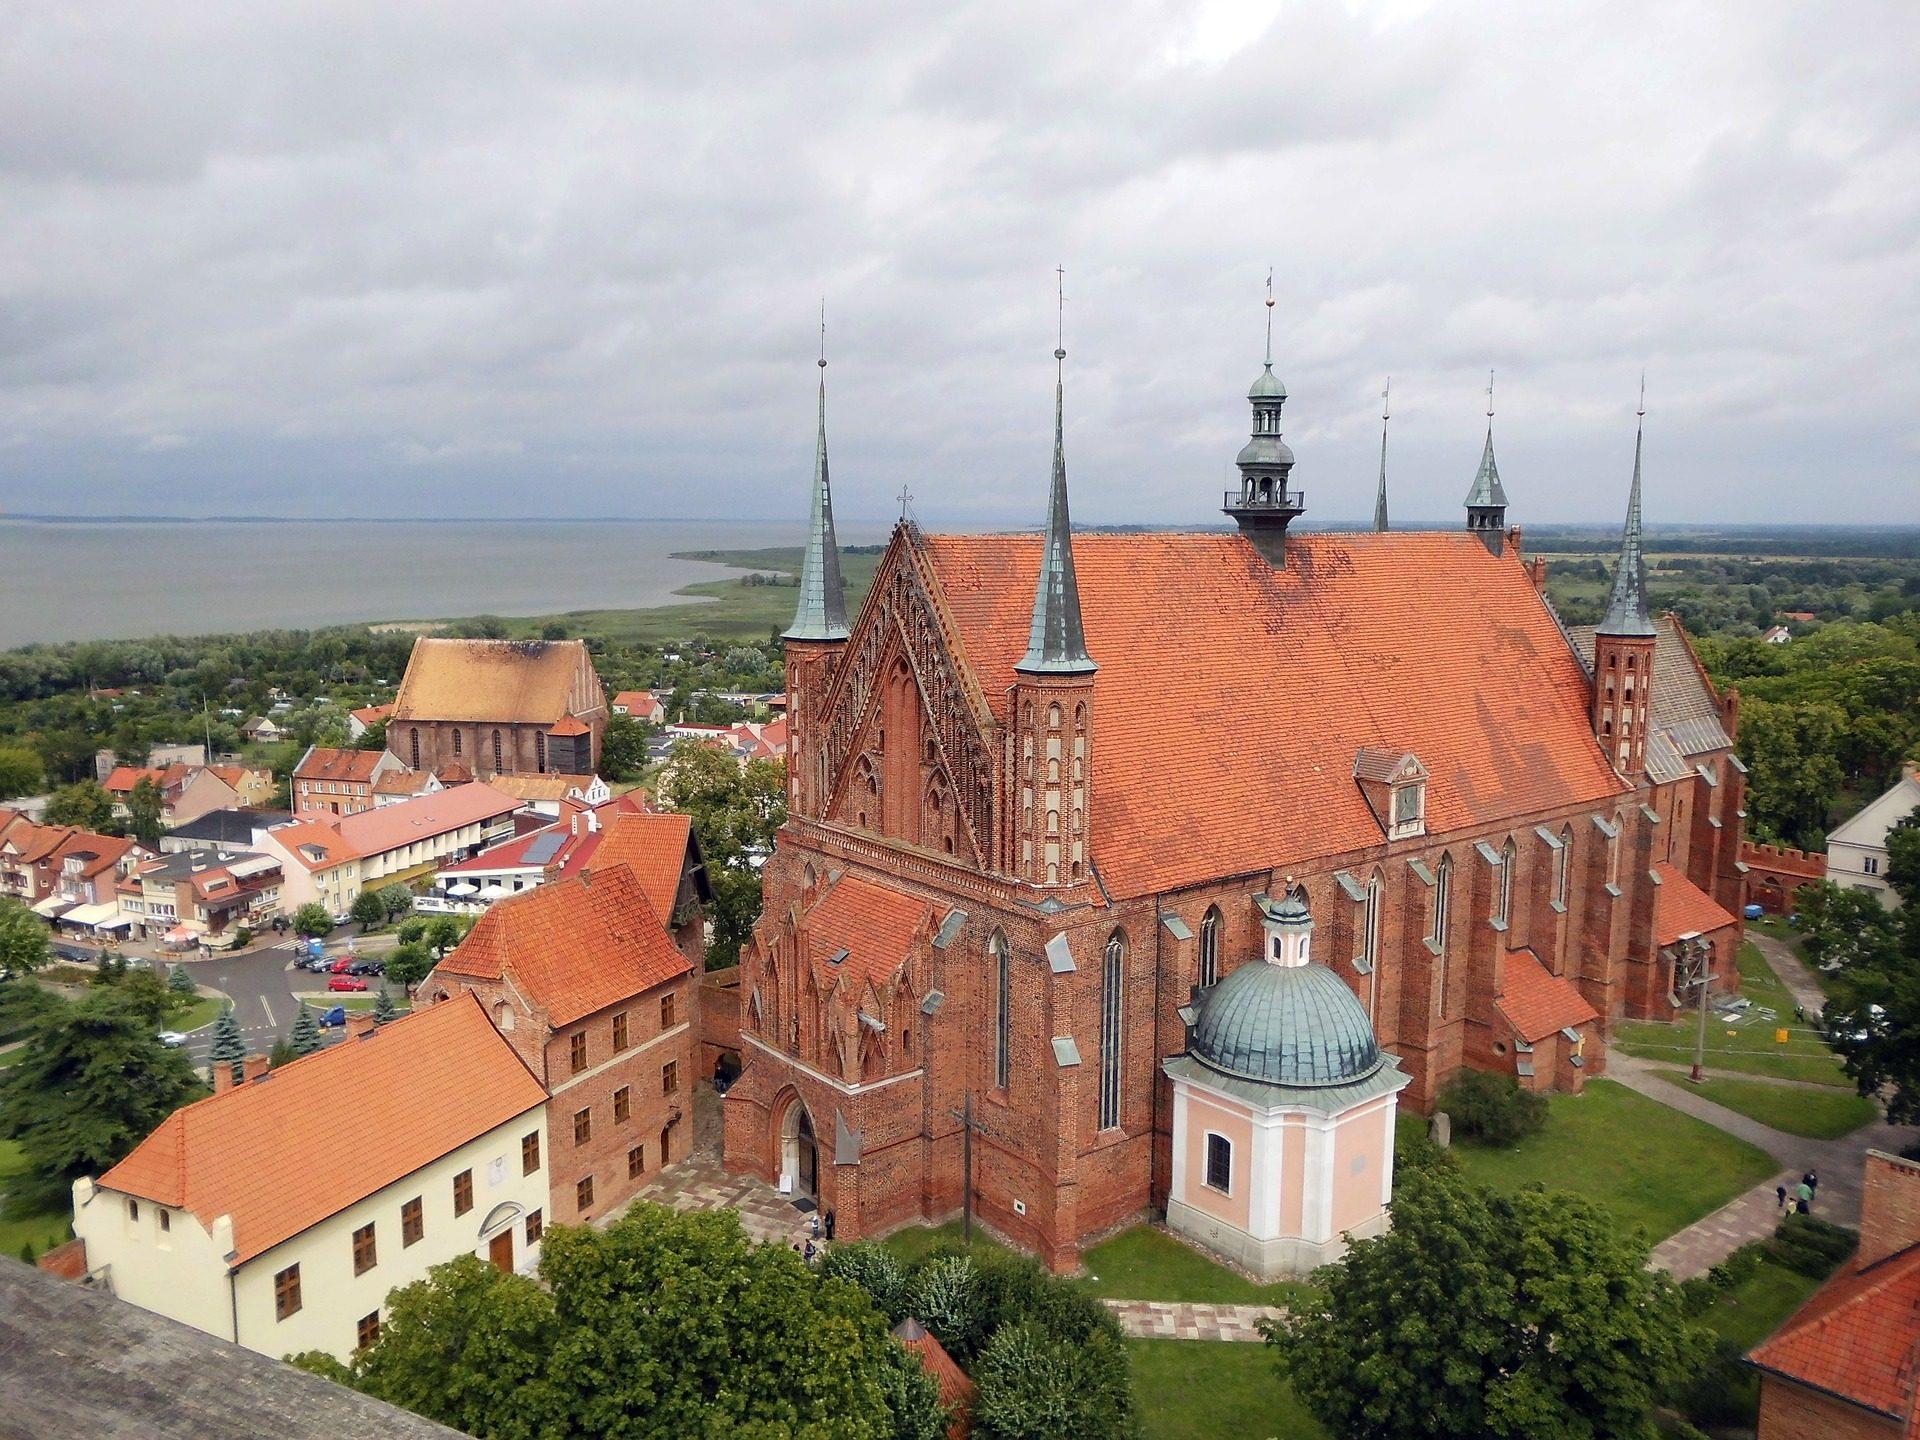 iglesia, catedral, pueblo, nubes, mrs burguer - Fondos de Pantalla HD - professor-falken.com